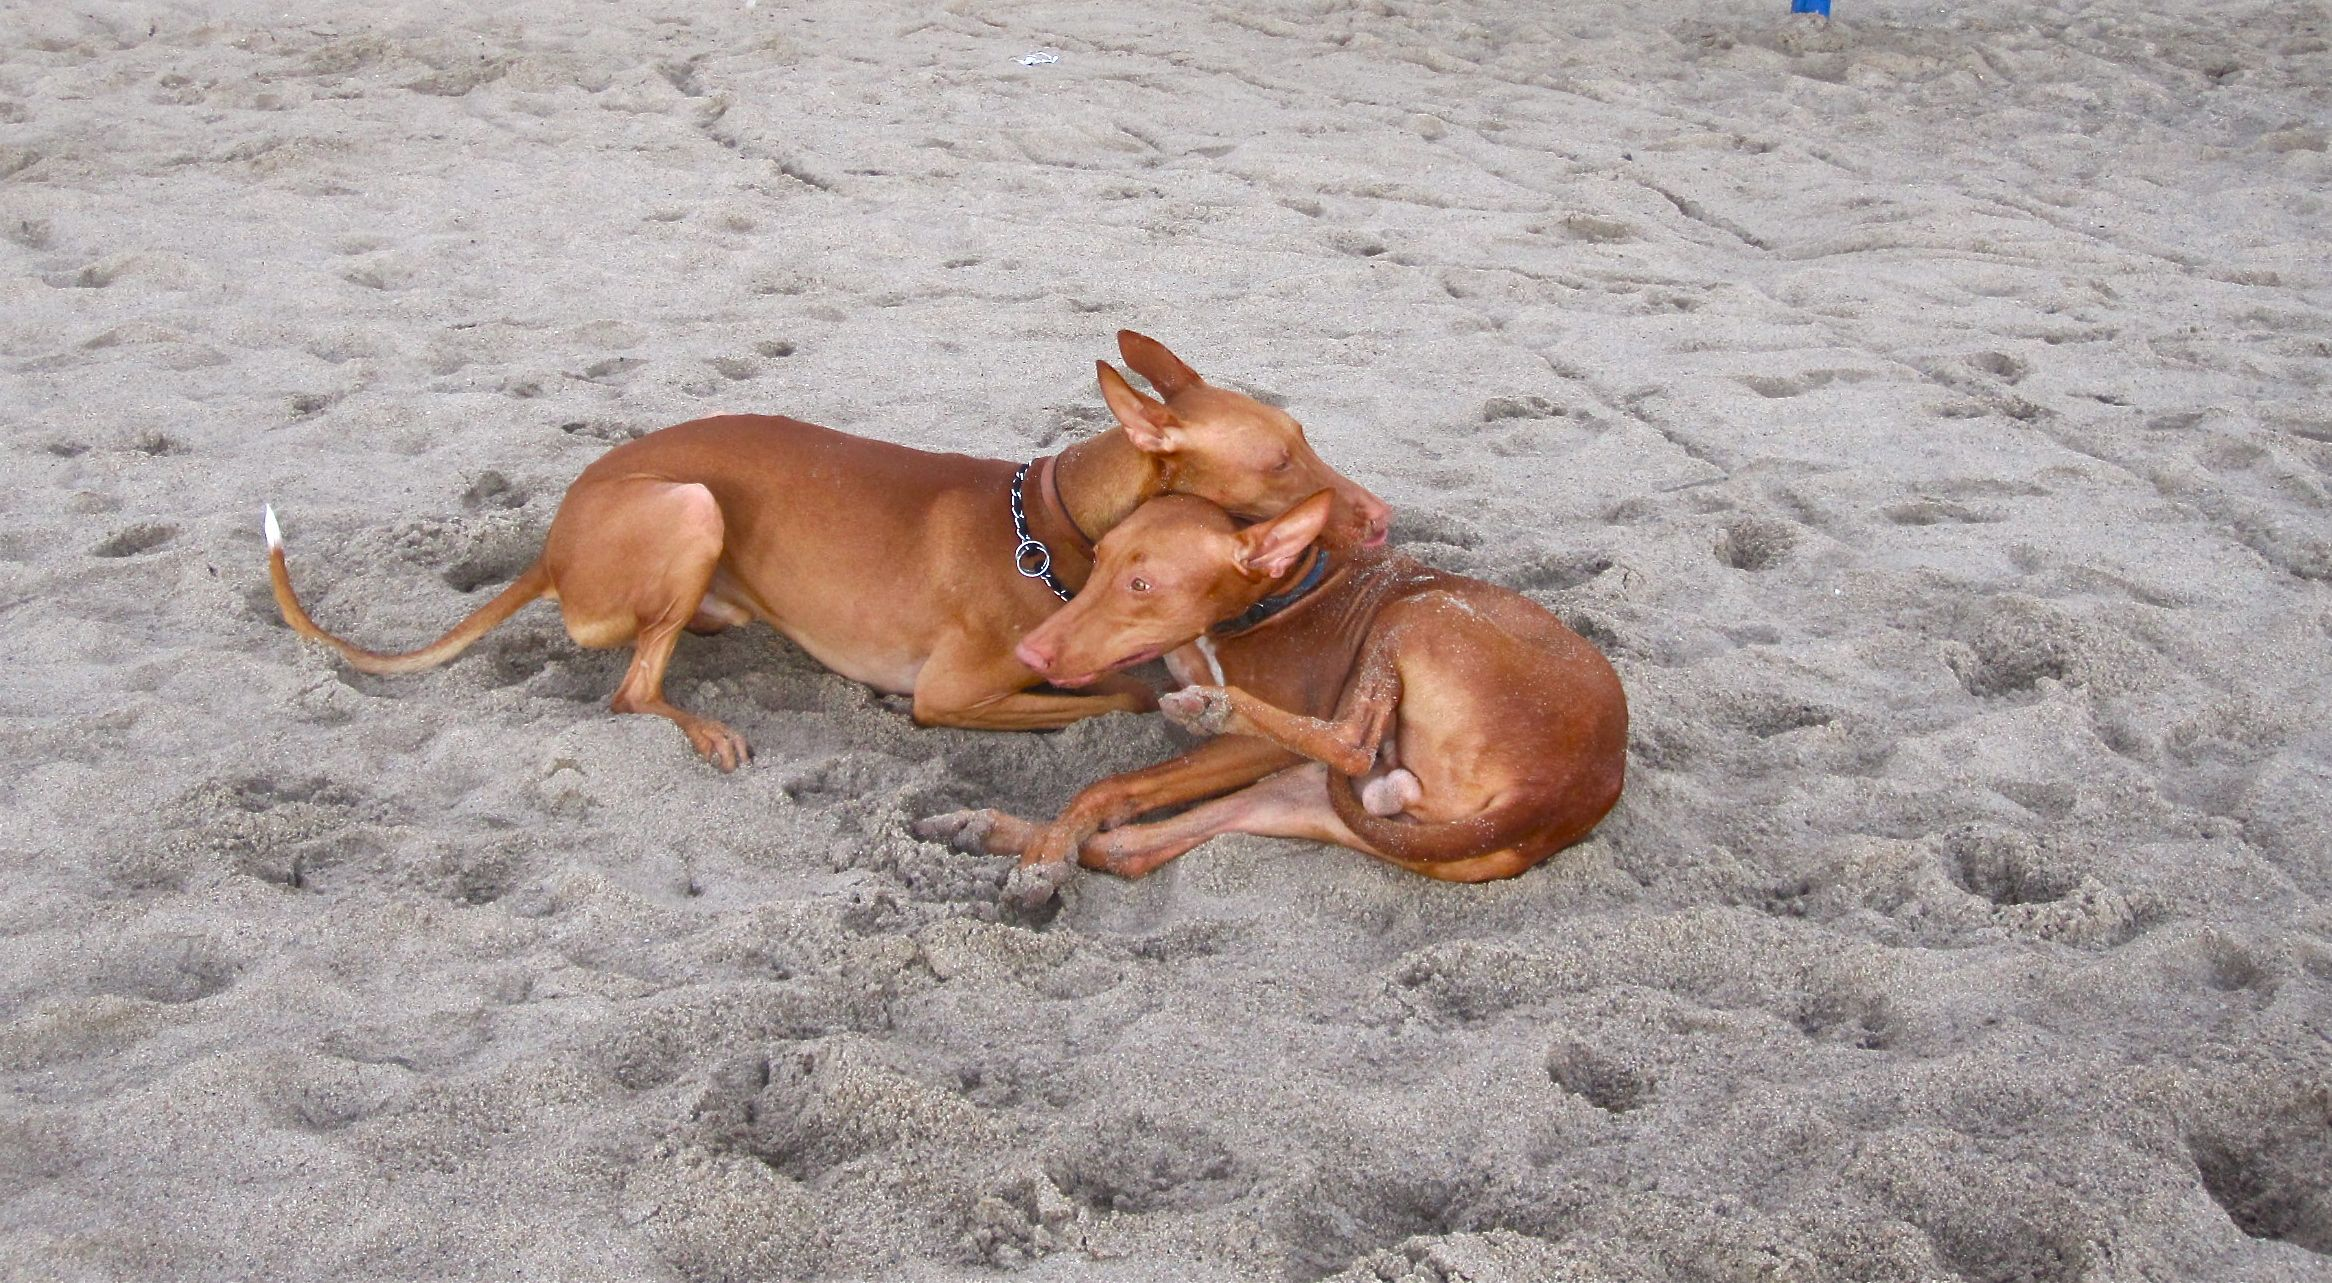 Pharaoh Hound dogs on the beach wallpaper